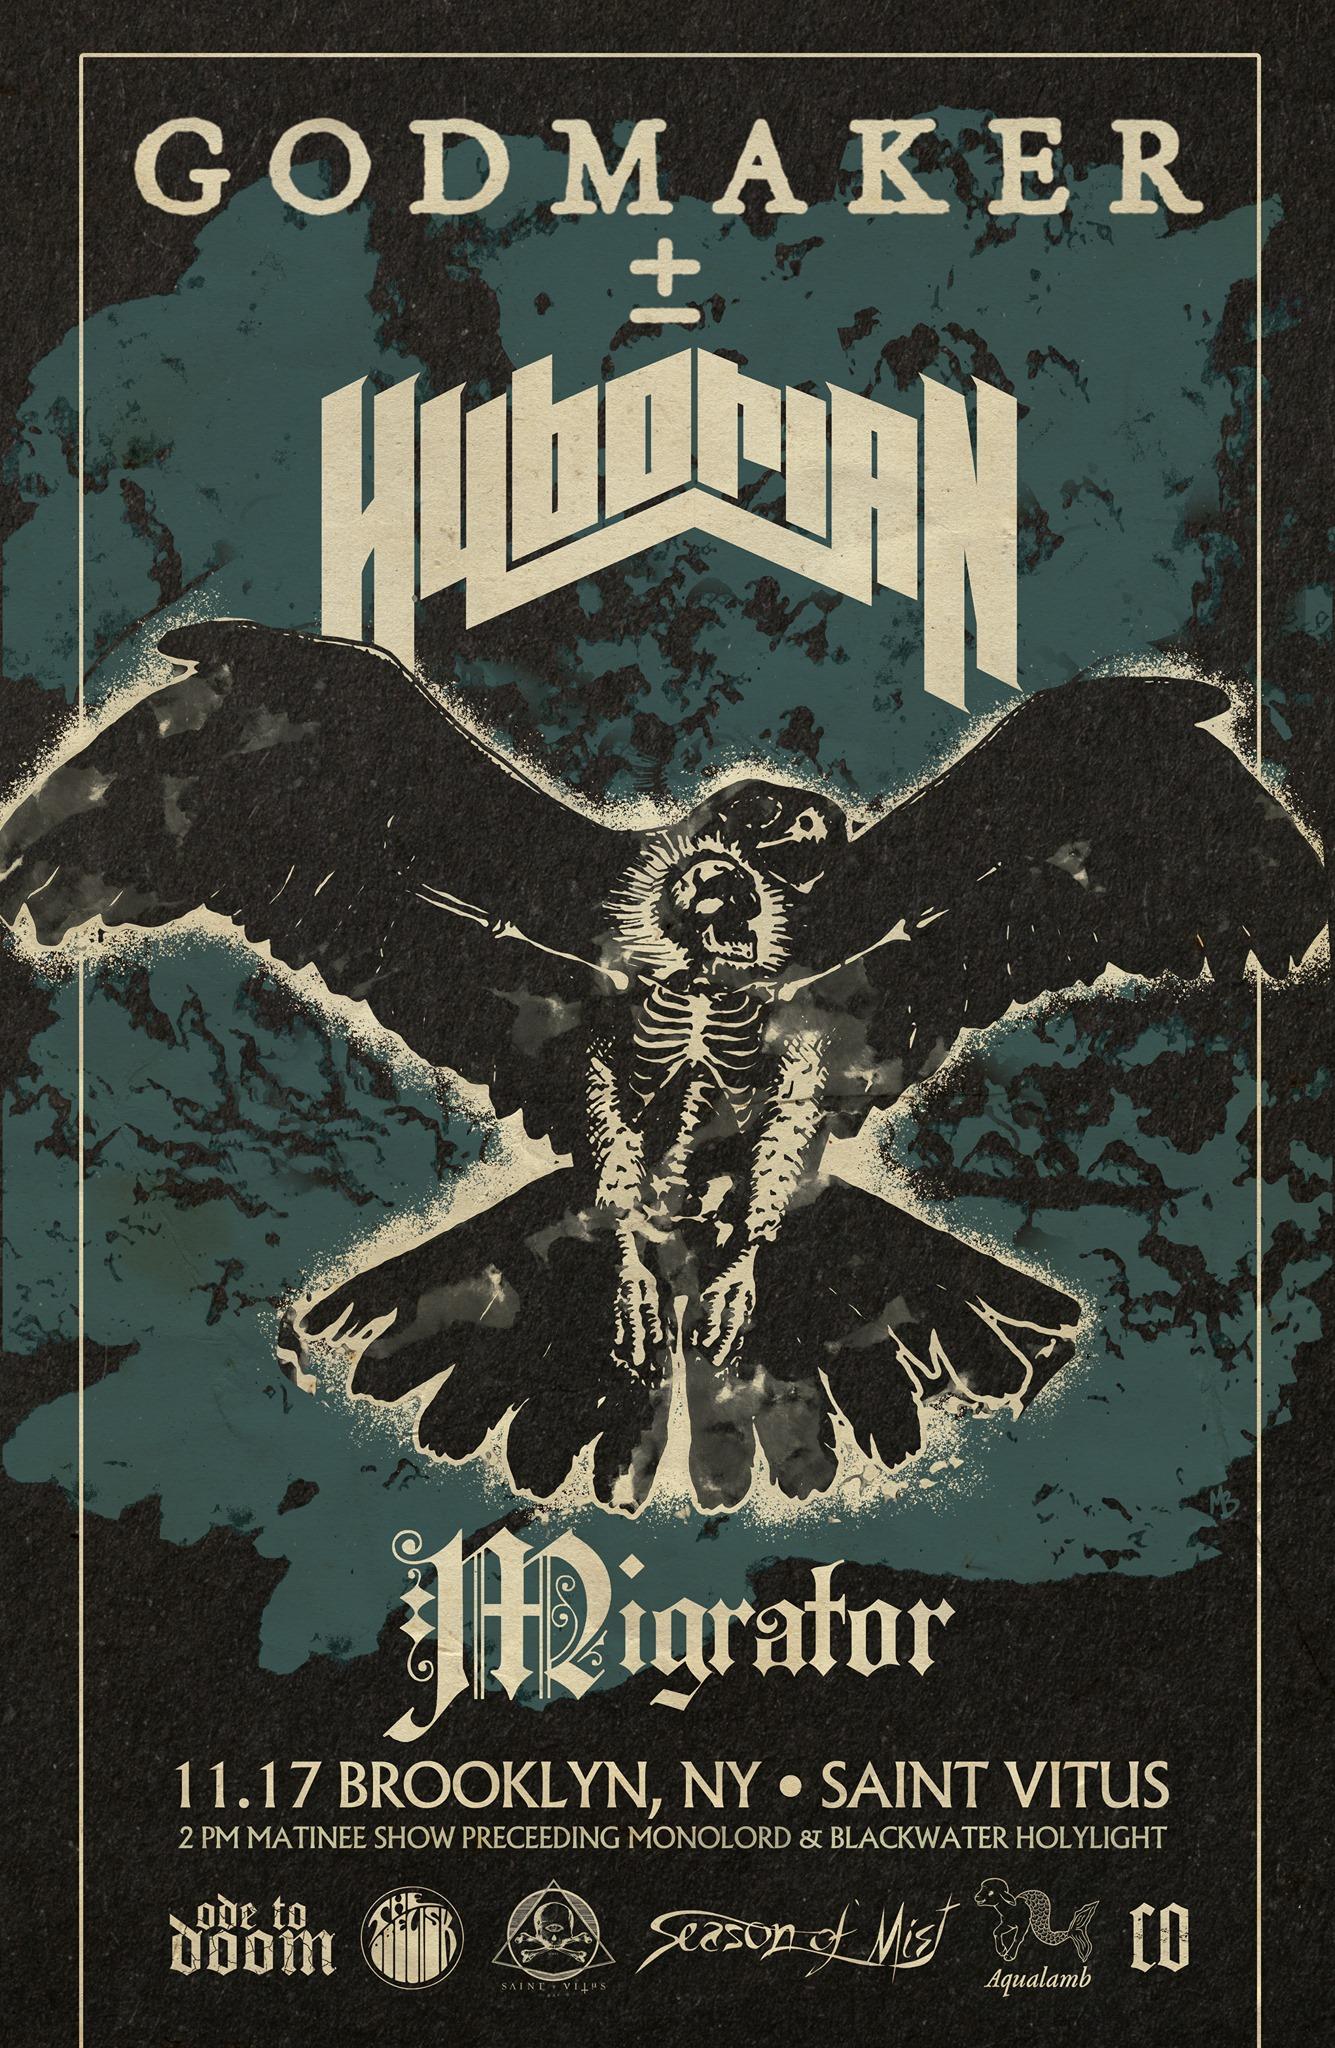 godmaker hyborian migrator new poster